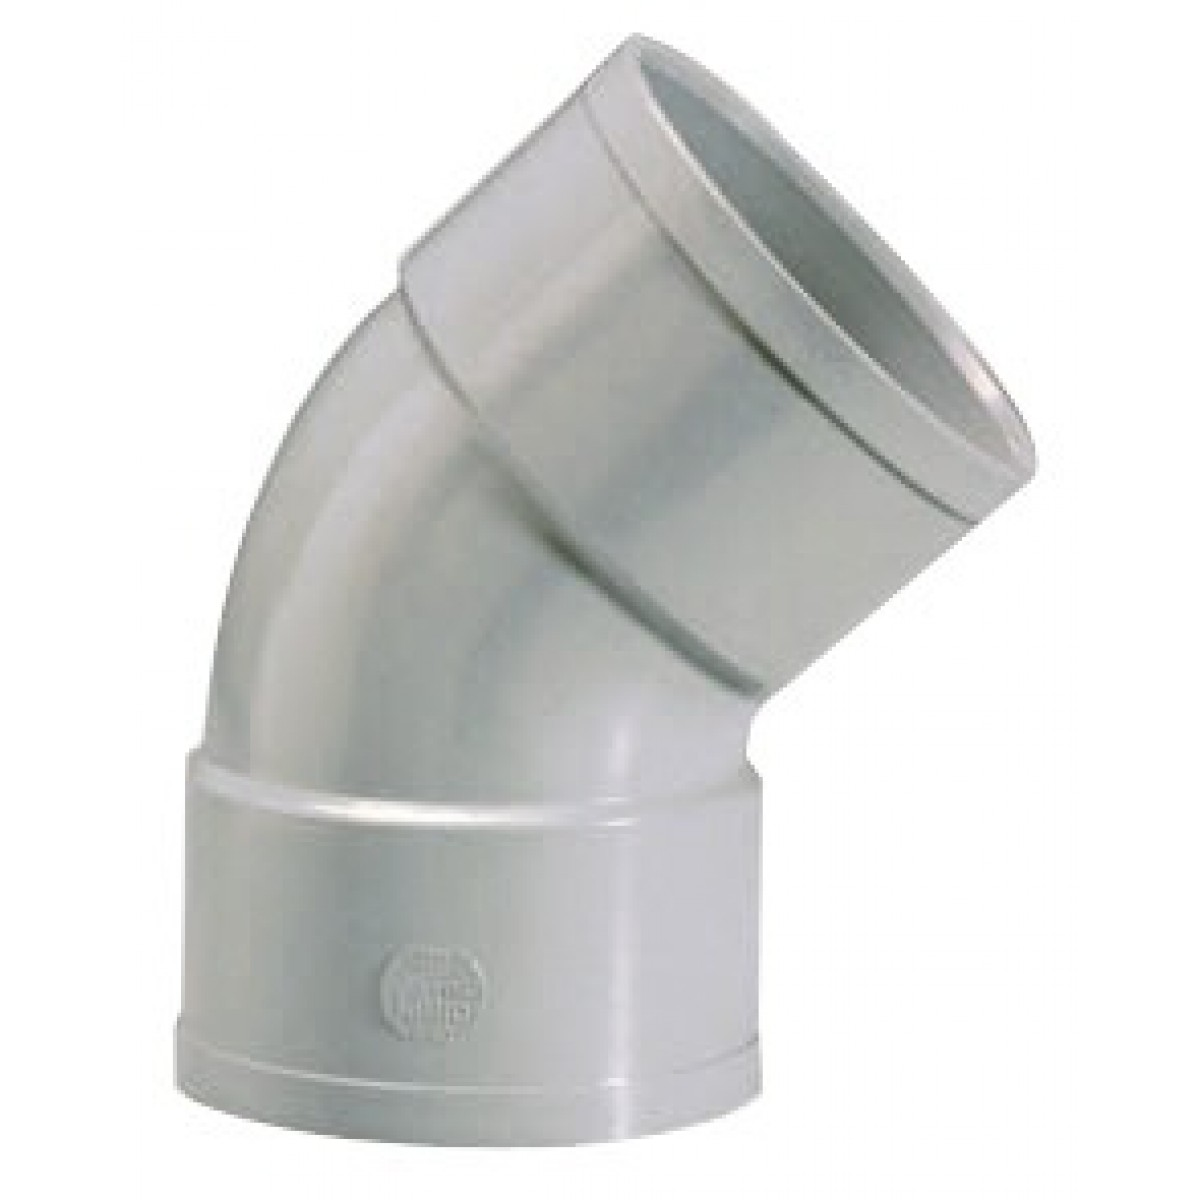 Coude à 45° Femelle / Femelle Girpi - Diamètre 125 mm